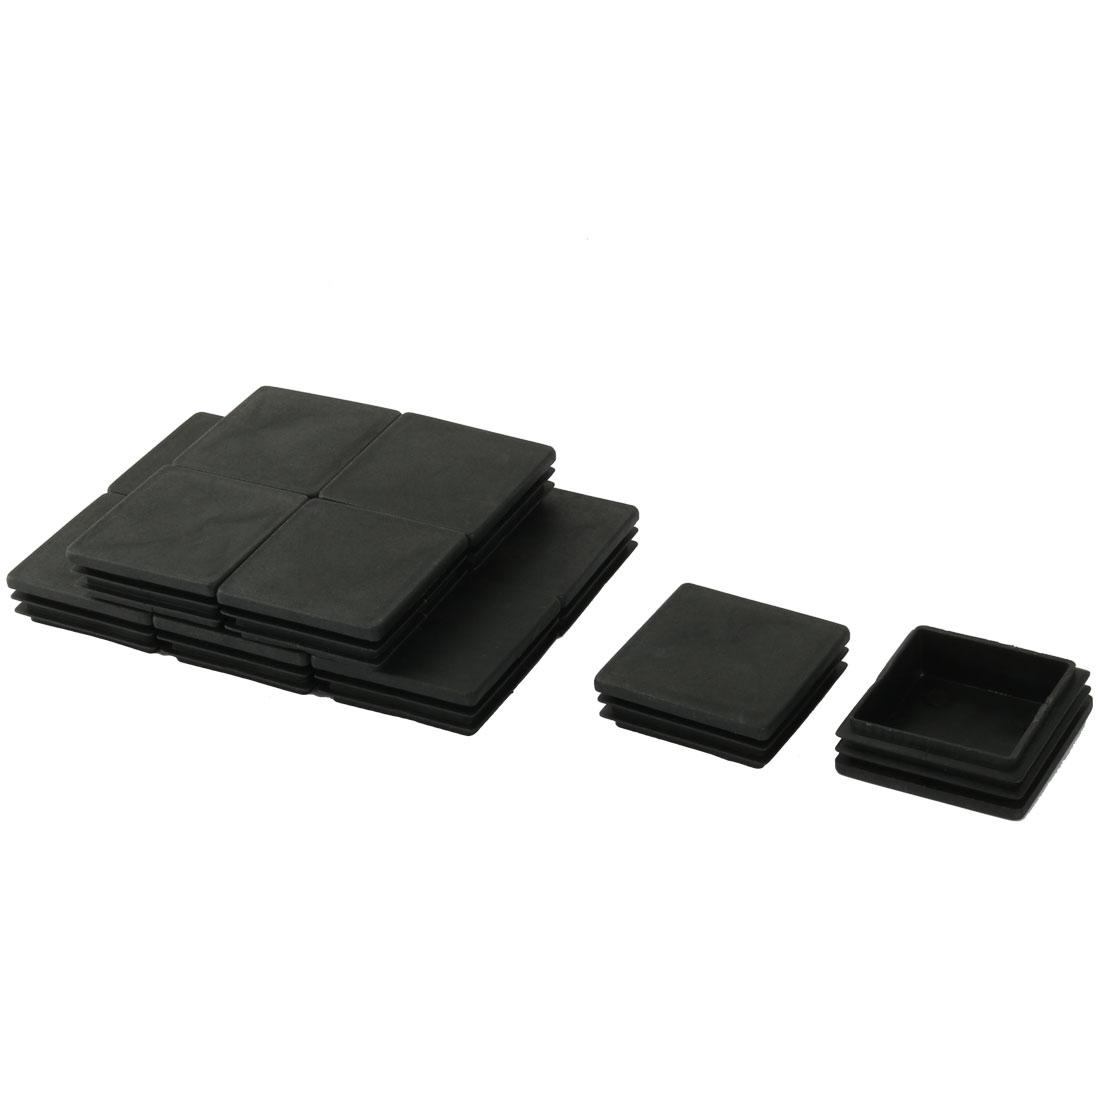 50mm x 50mm Black Hard Plastic Tubing Tube Insert Blanking End Caps 12Pcs